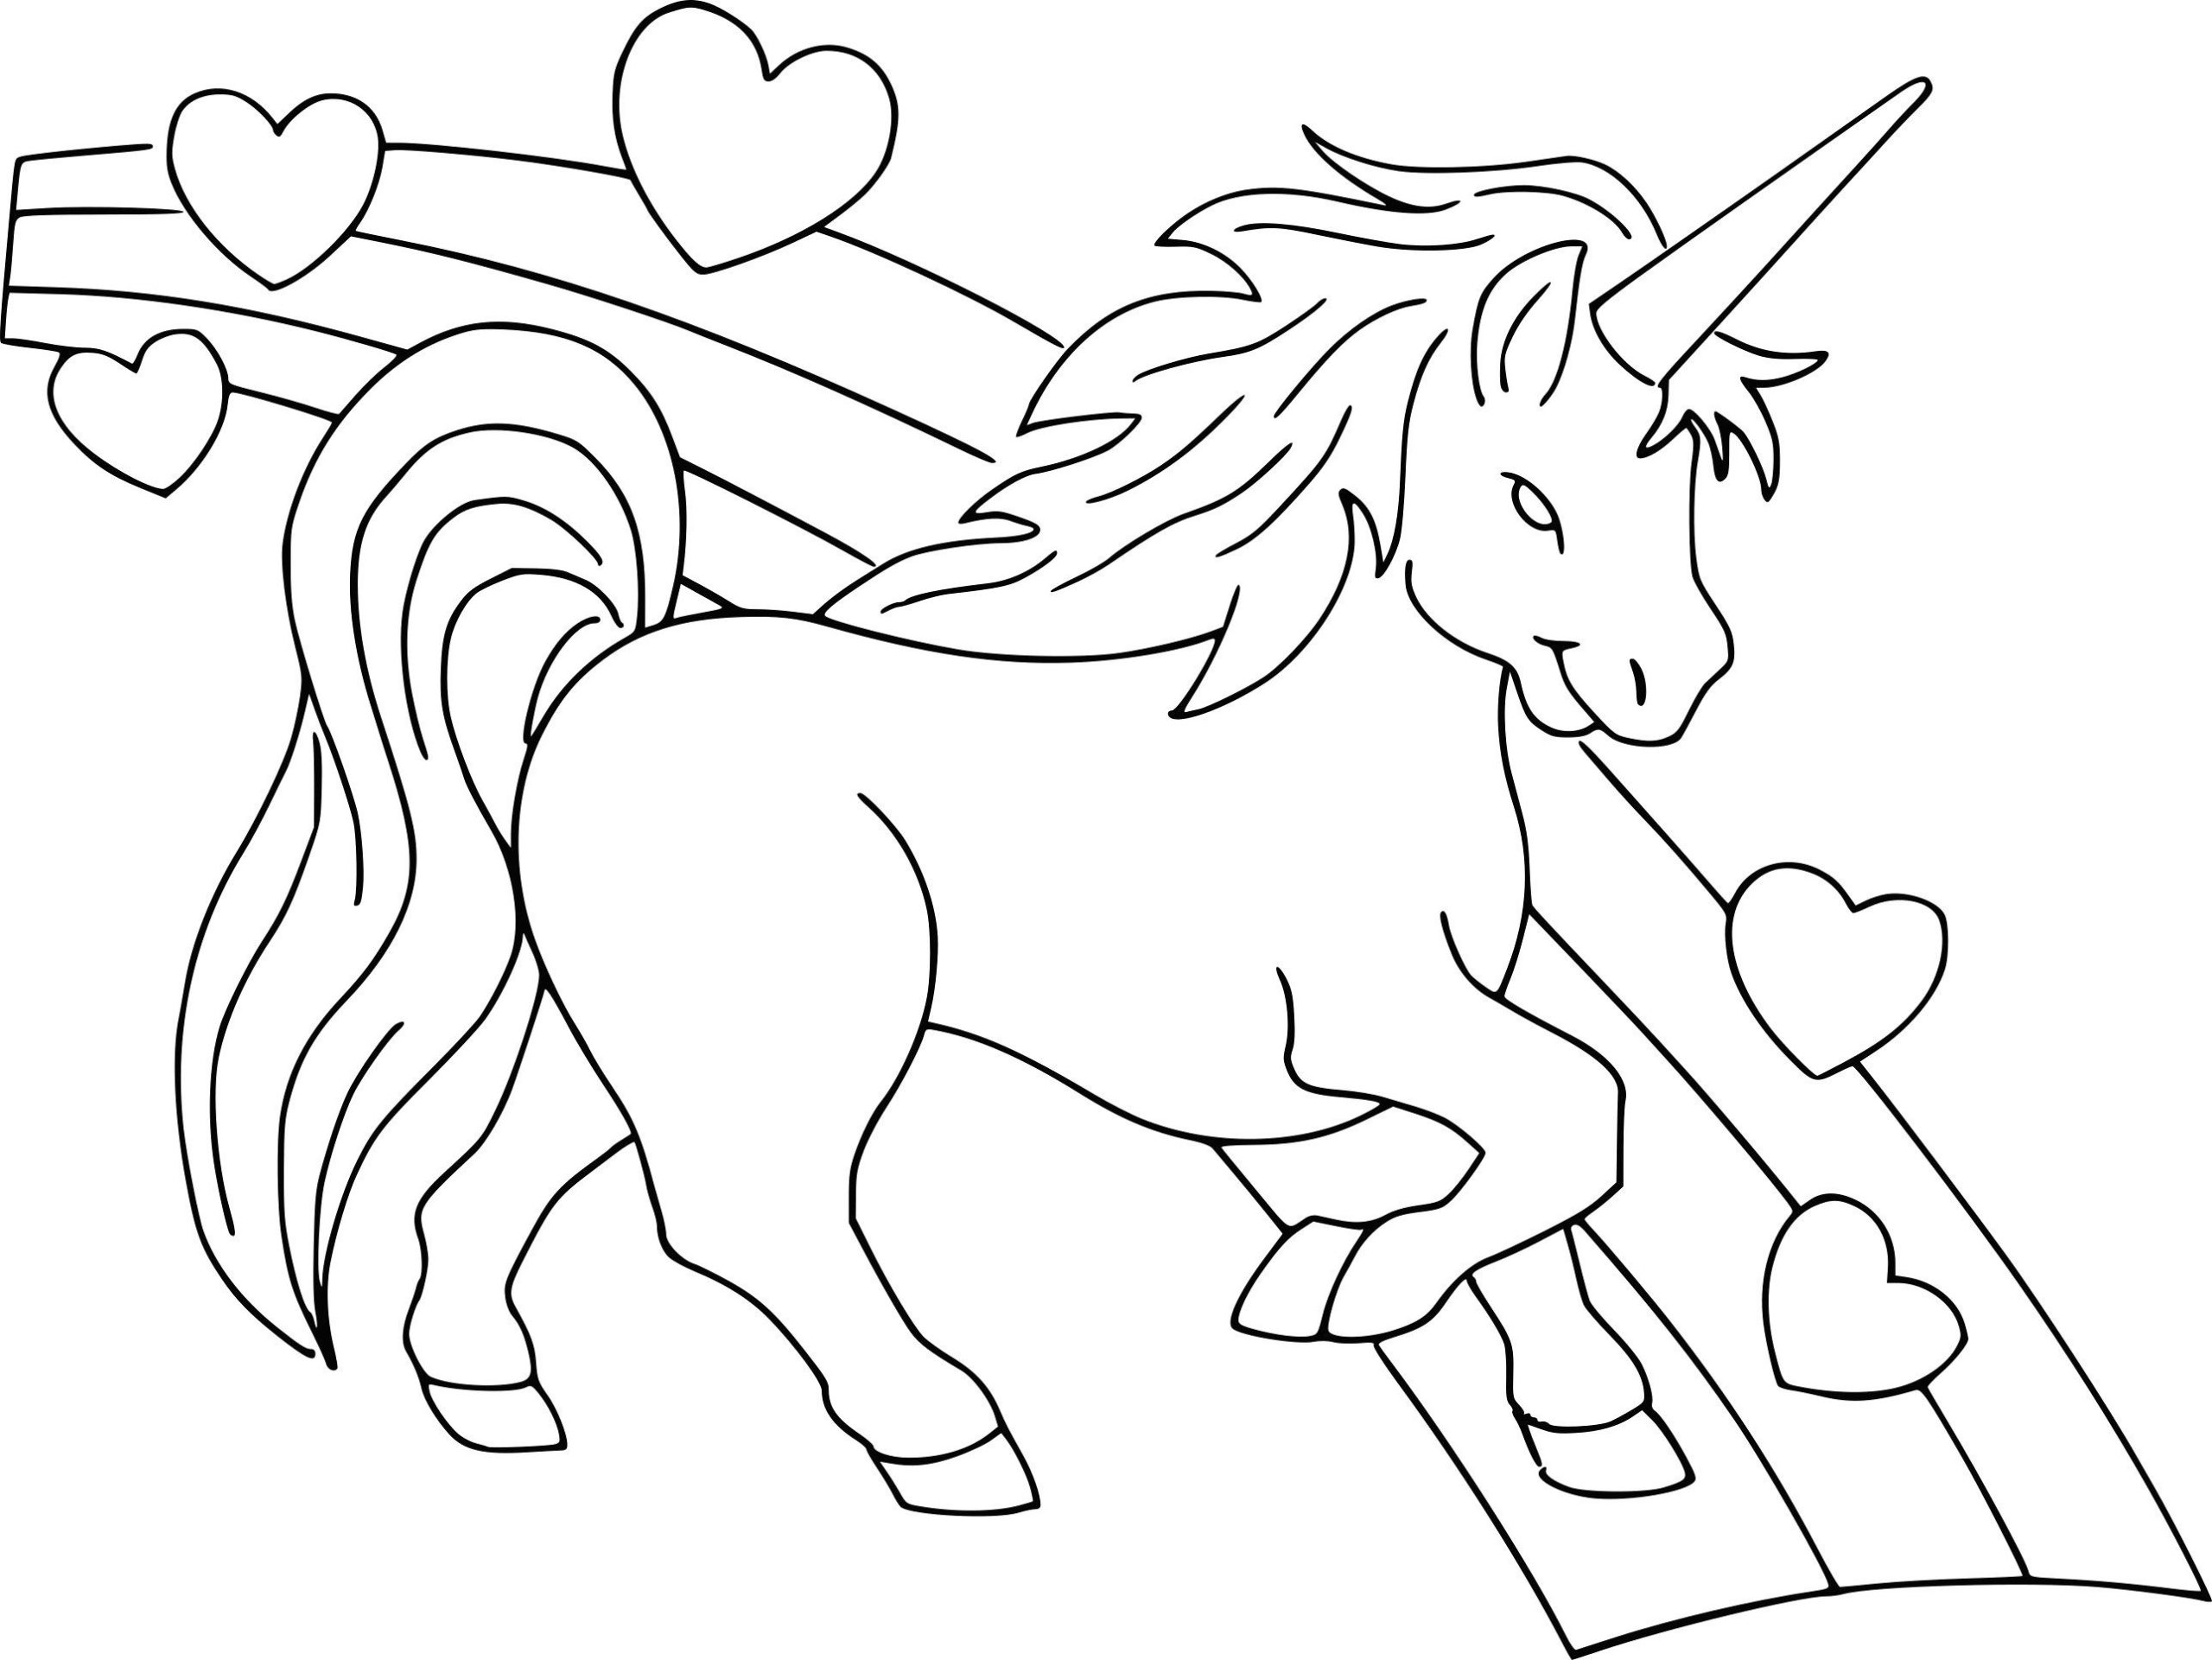 Coloriage Licorne Huntcounty Avec Coloriages Coloriage destiné Jeux De Coloriage Licorne